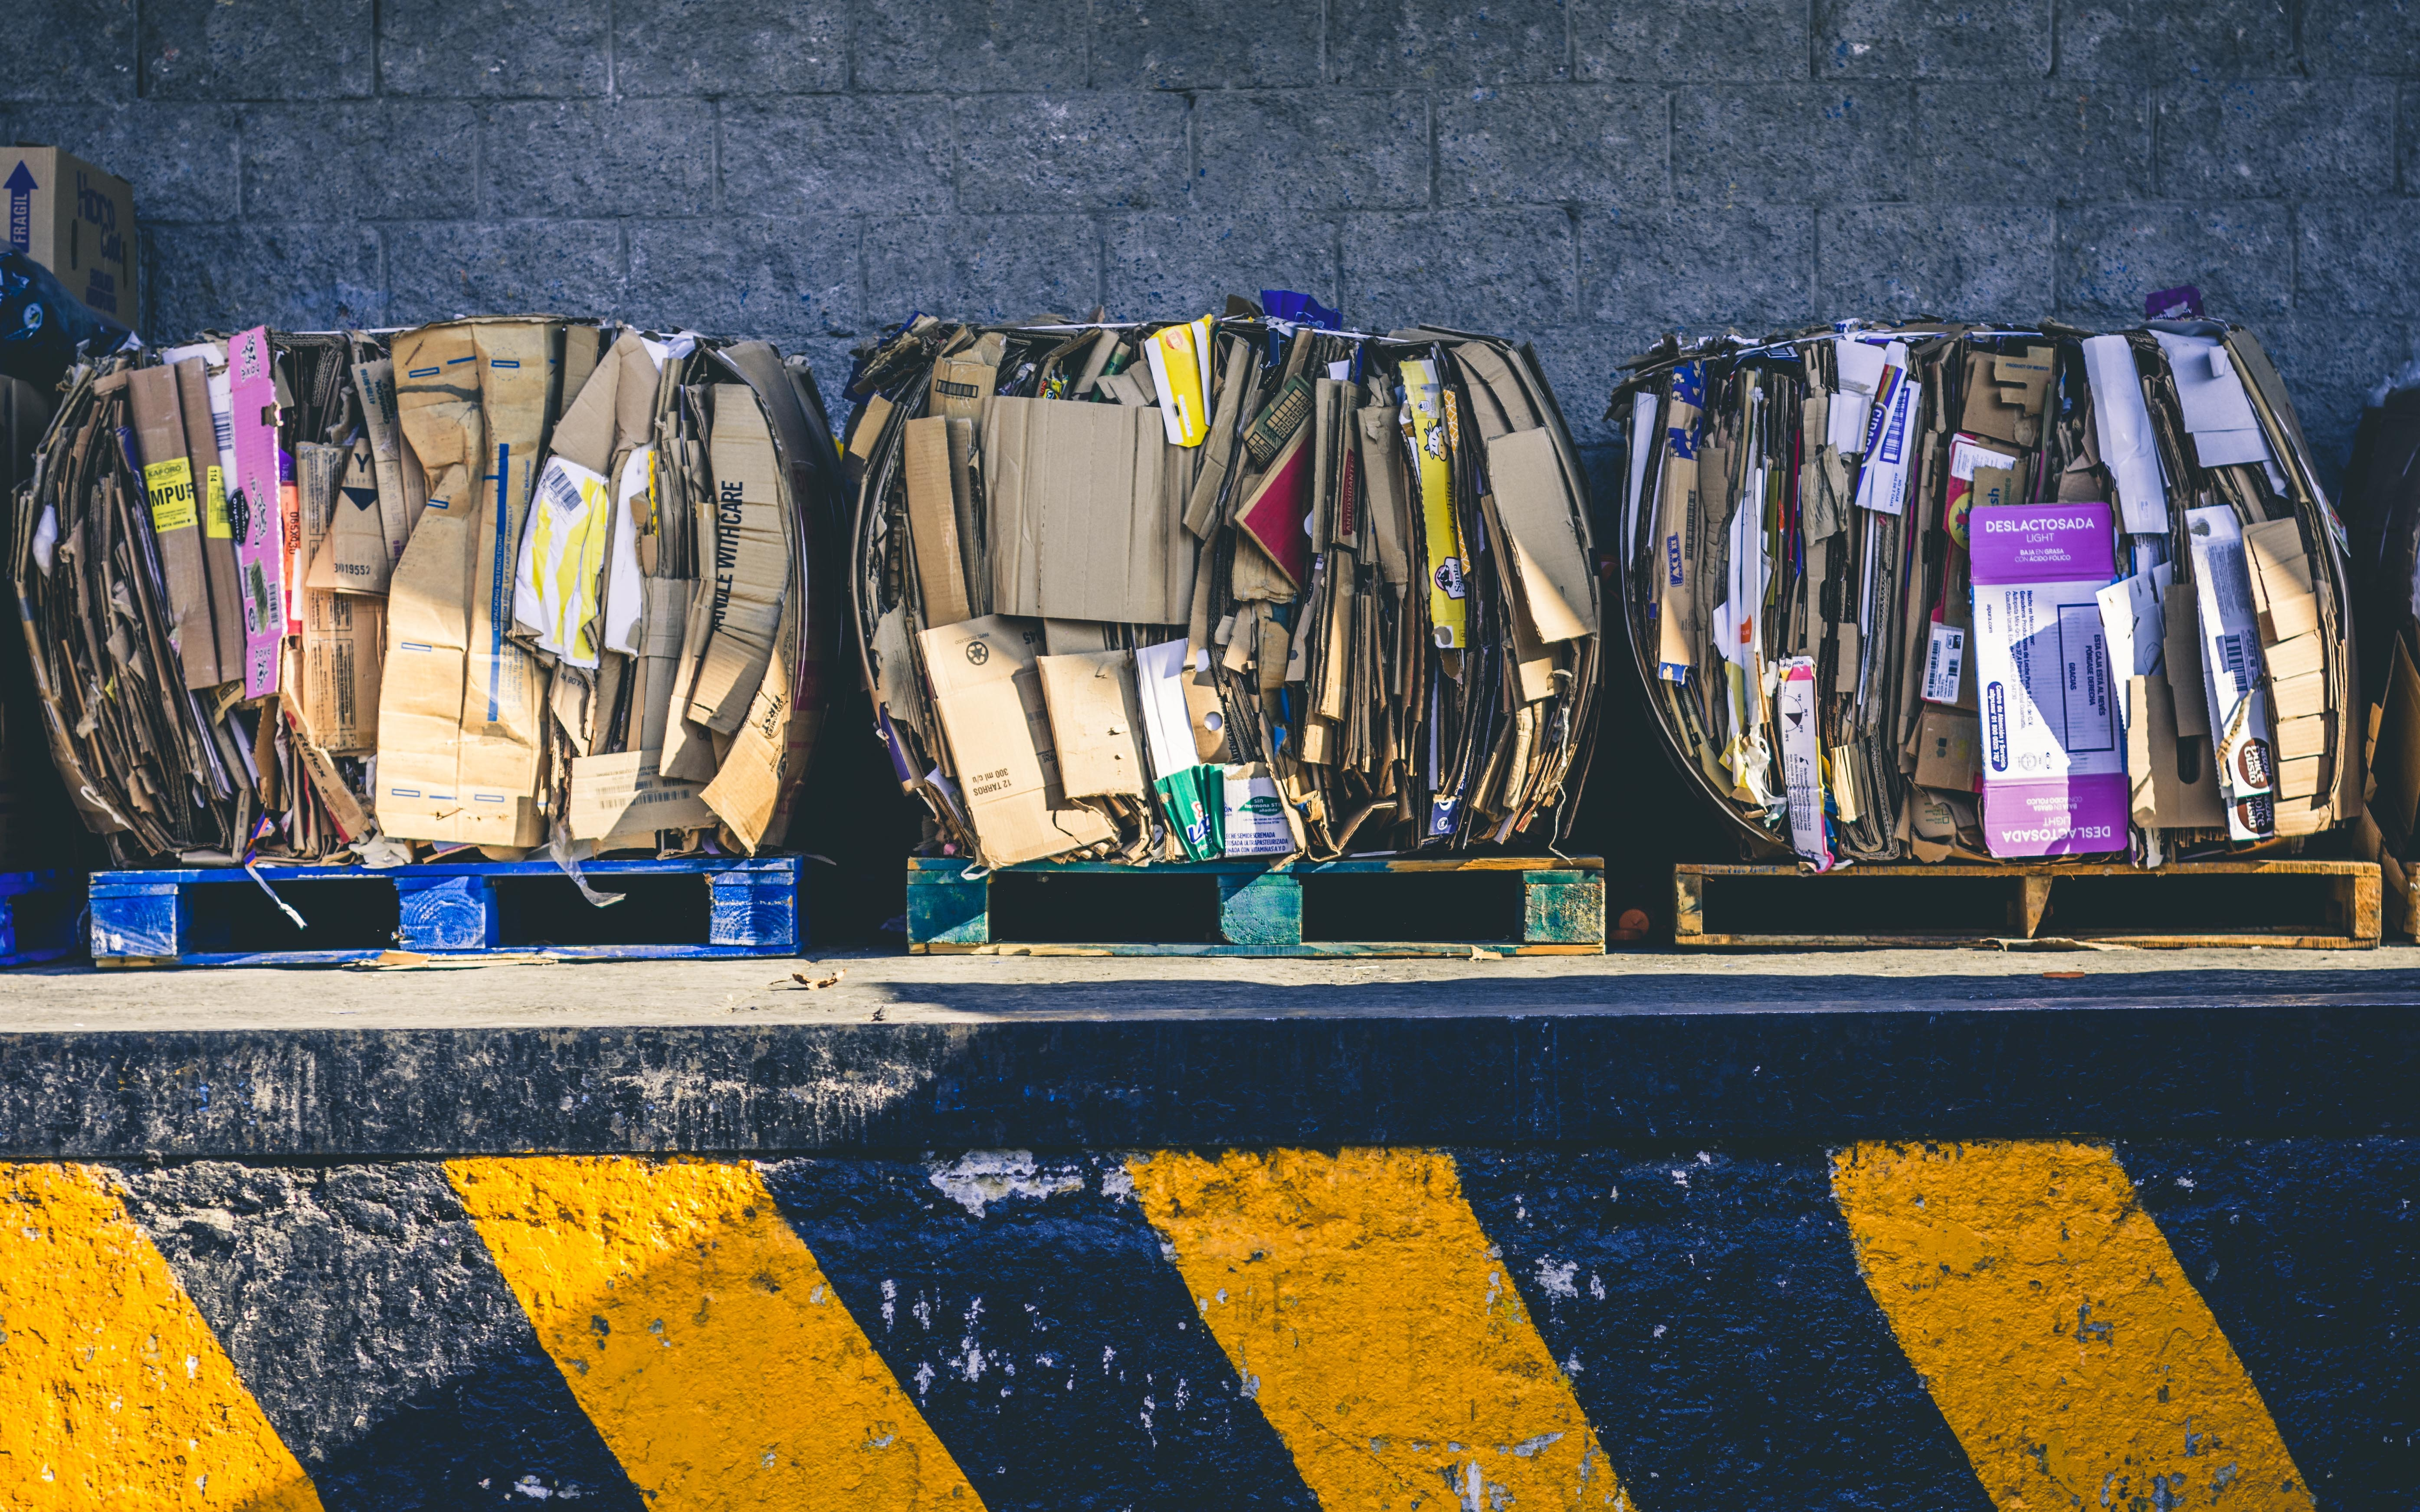 Boxes Crushed on Pallets - alfonso-navarro-unsplash